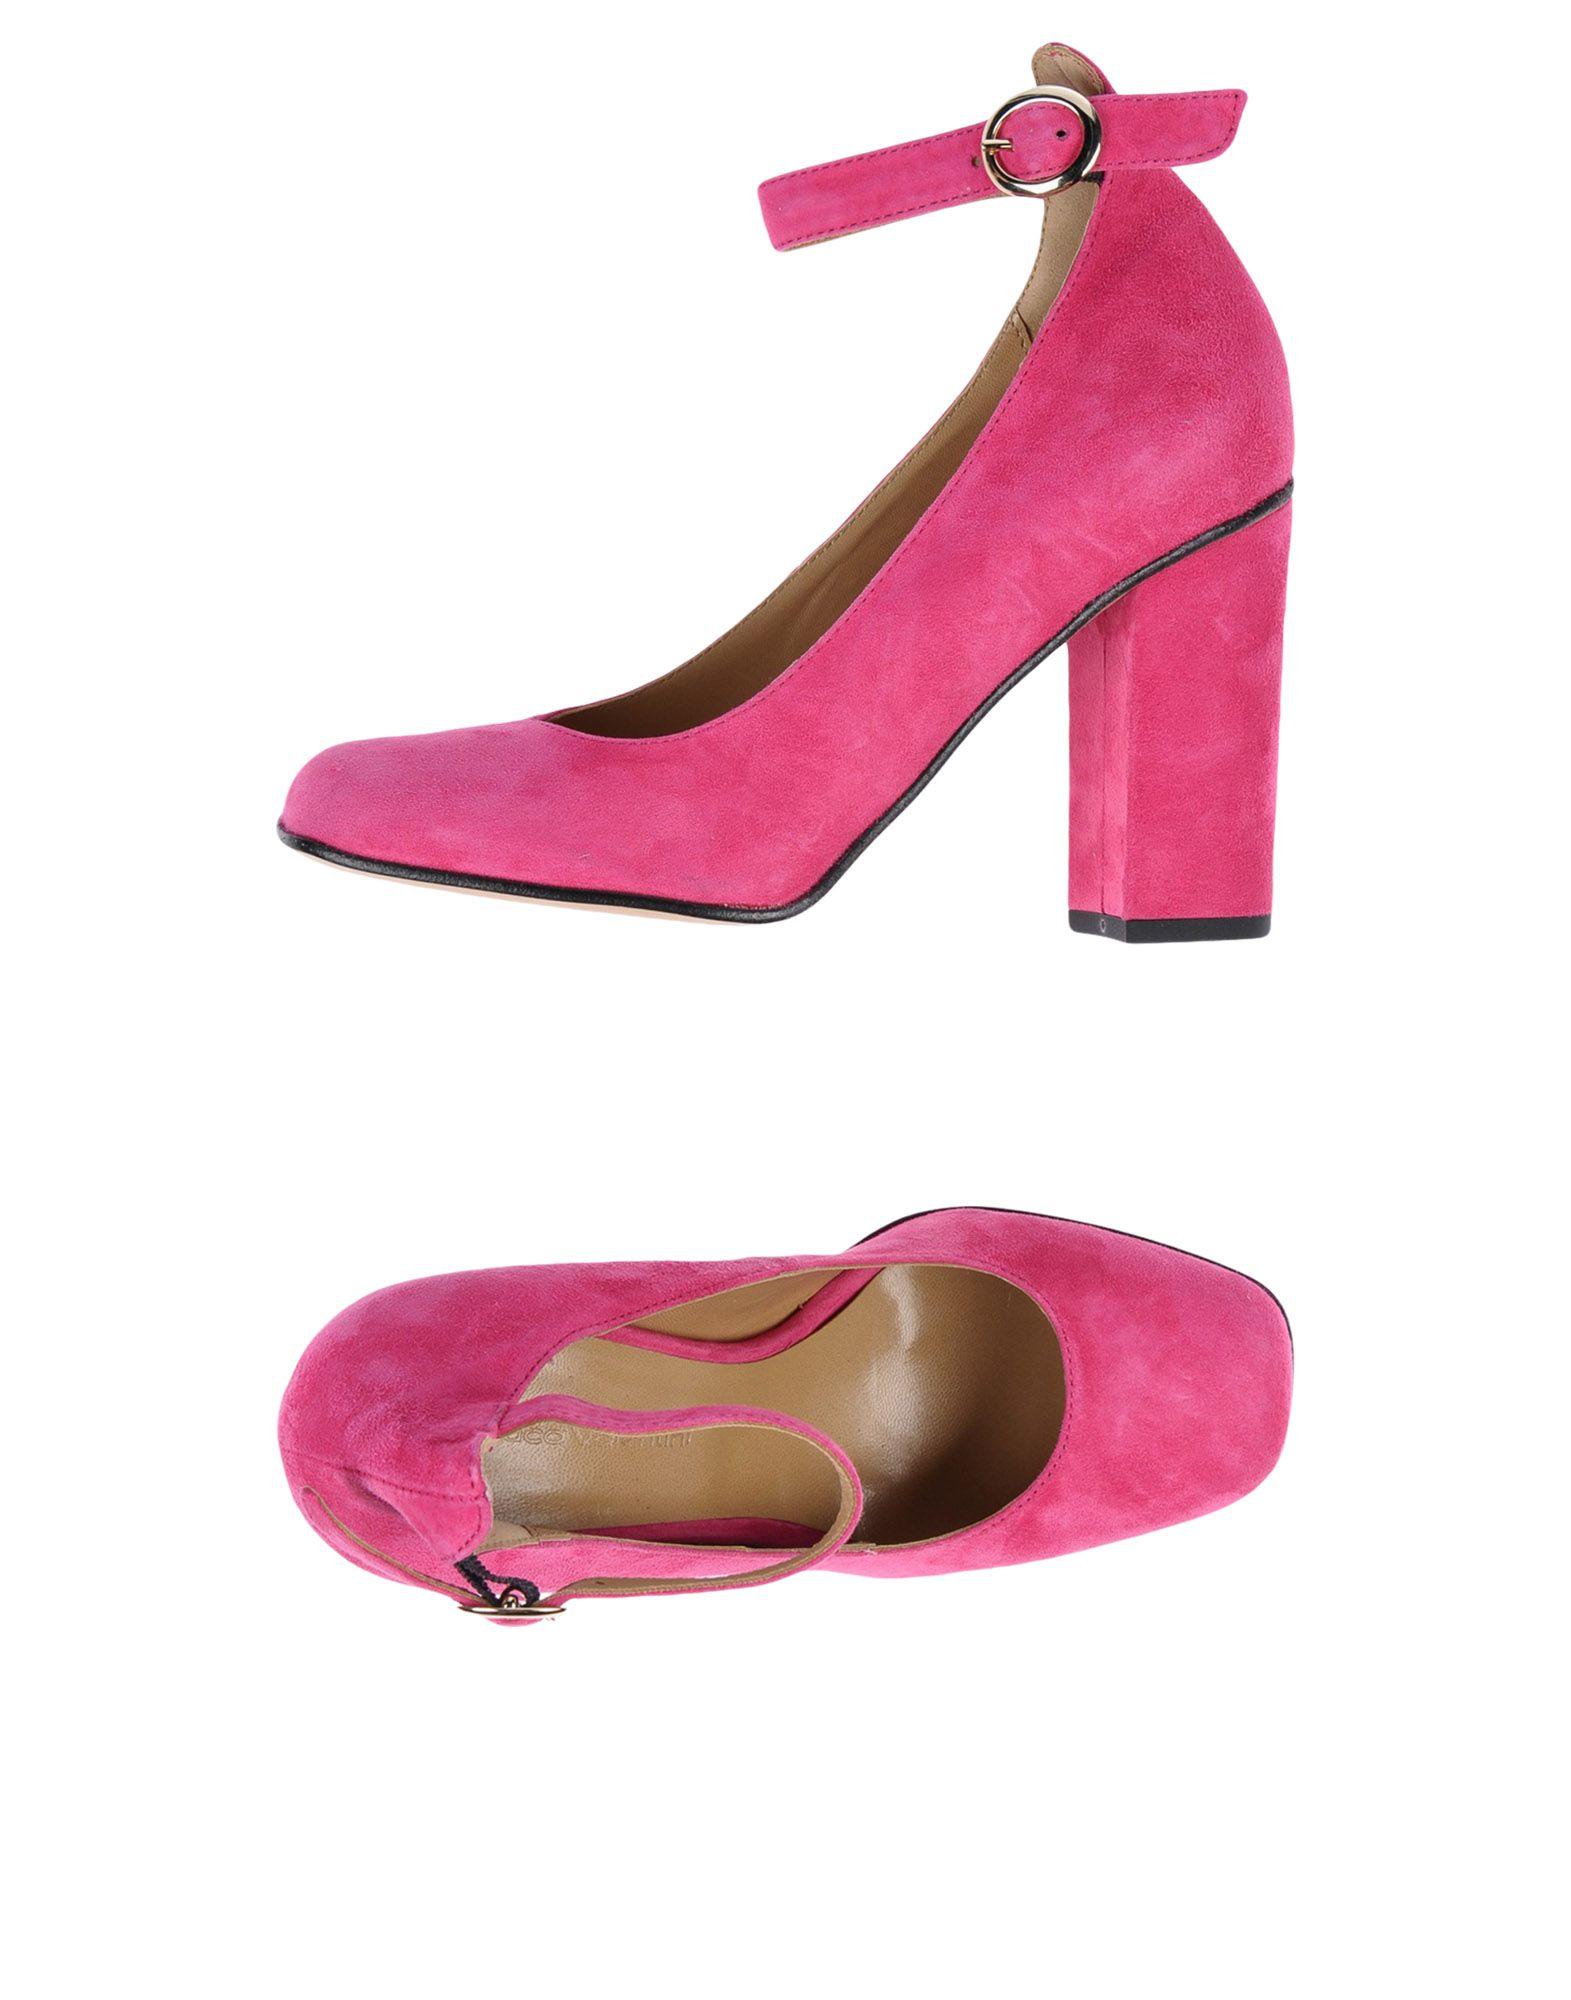 Luca Valentini Pumps 11294978IC Damen  11294978IC Pumps Gute Qualität beliebte Schuhe 61592f